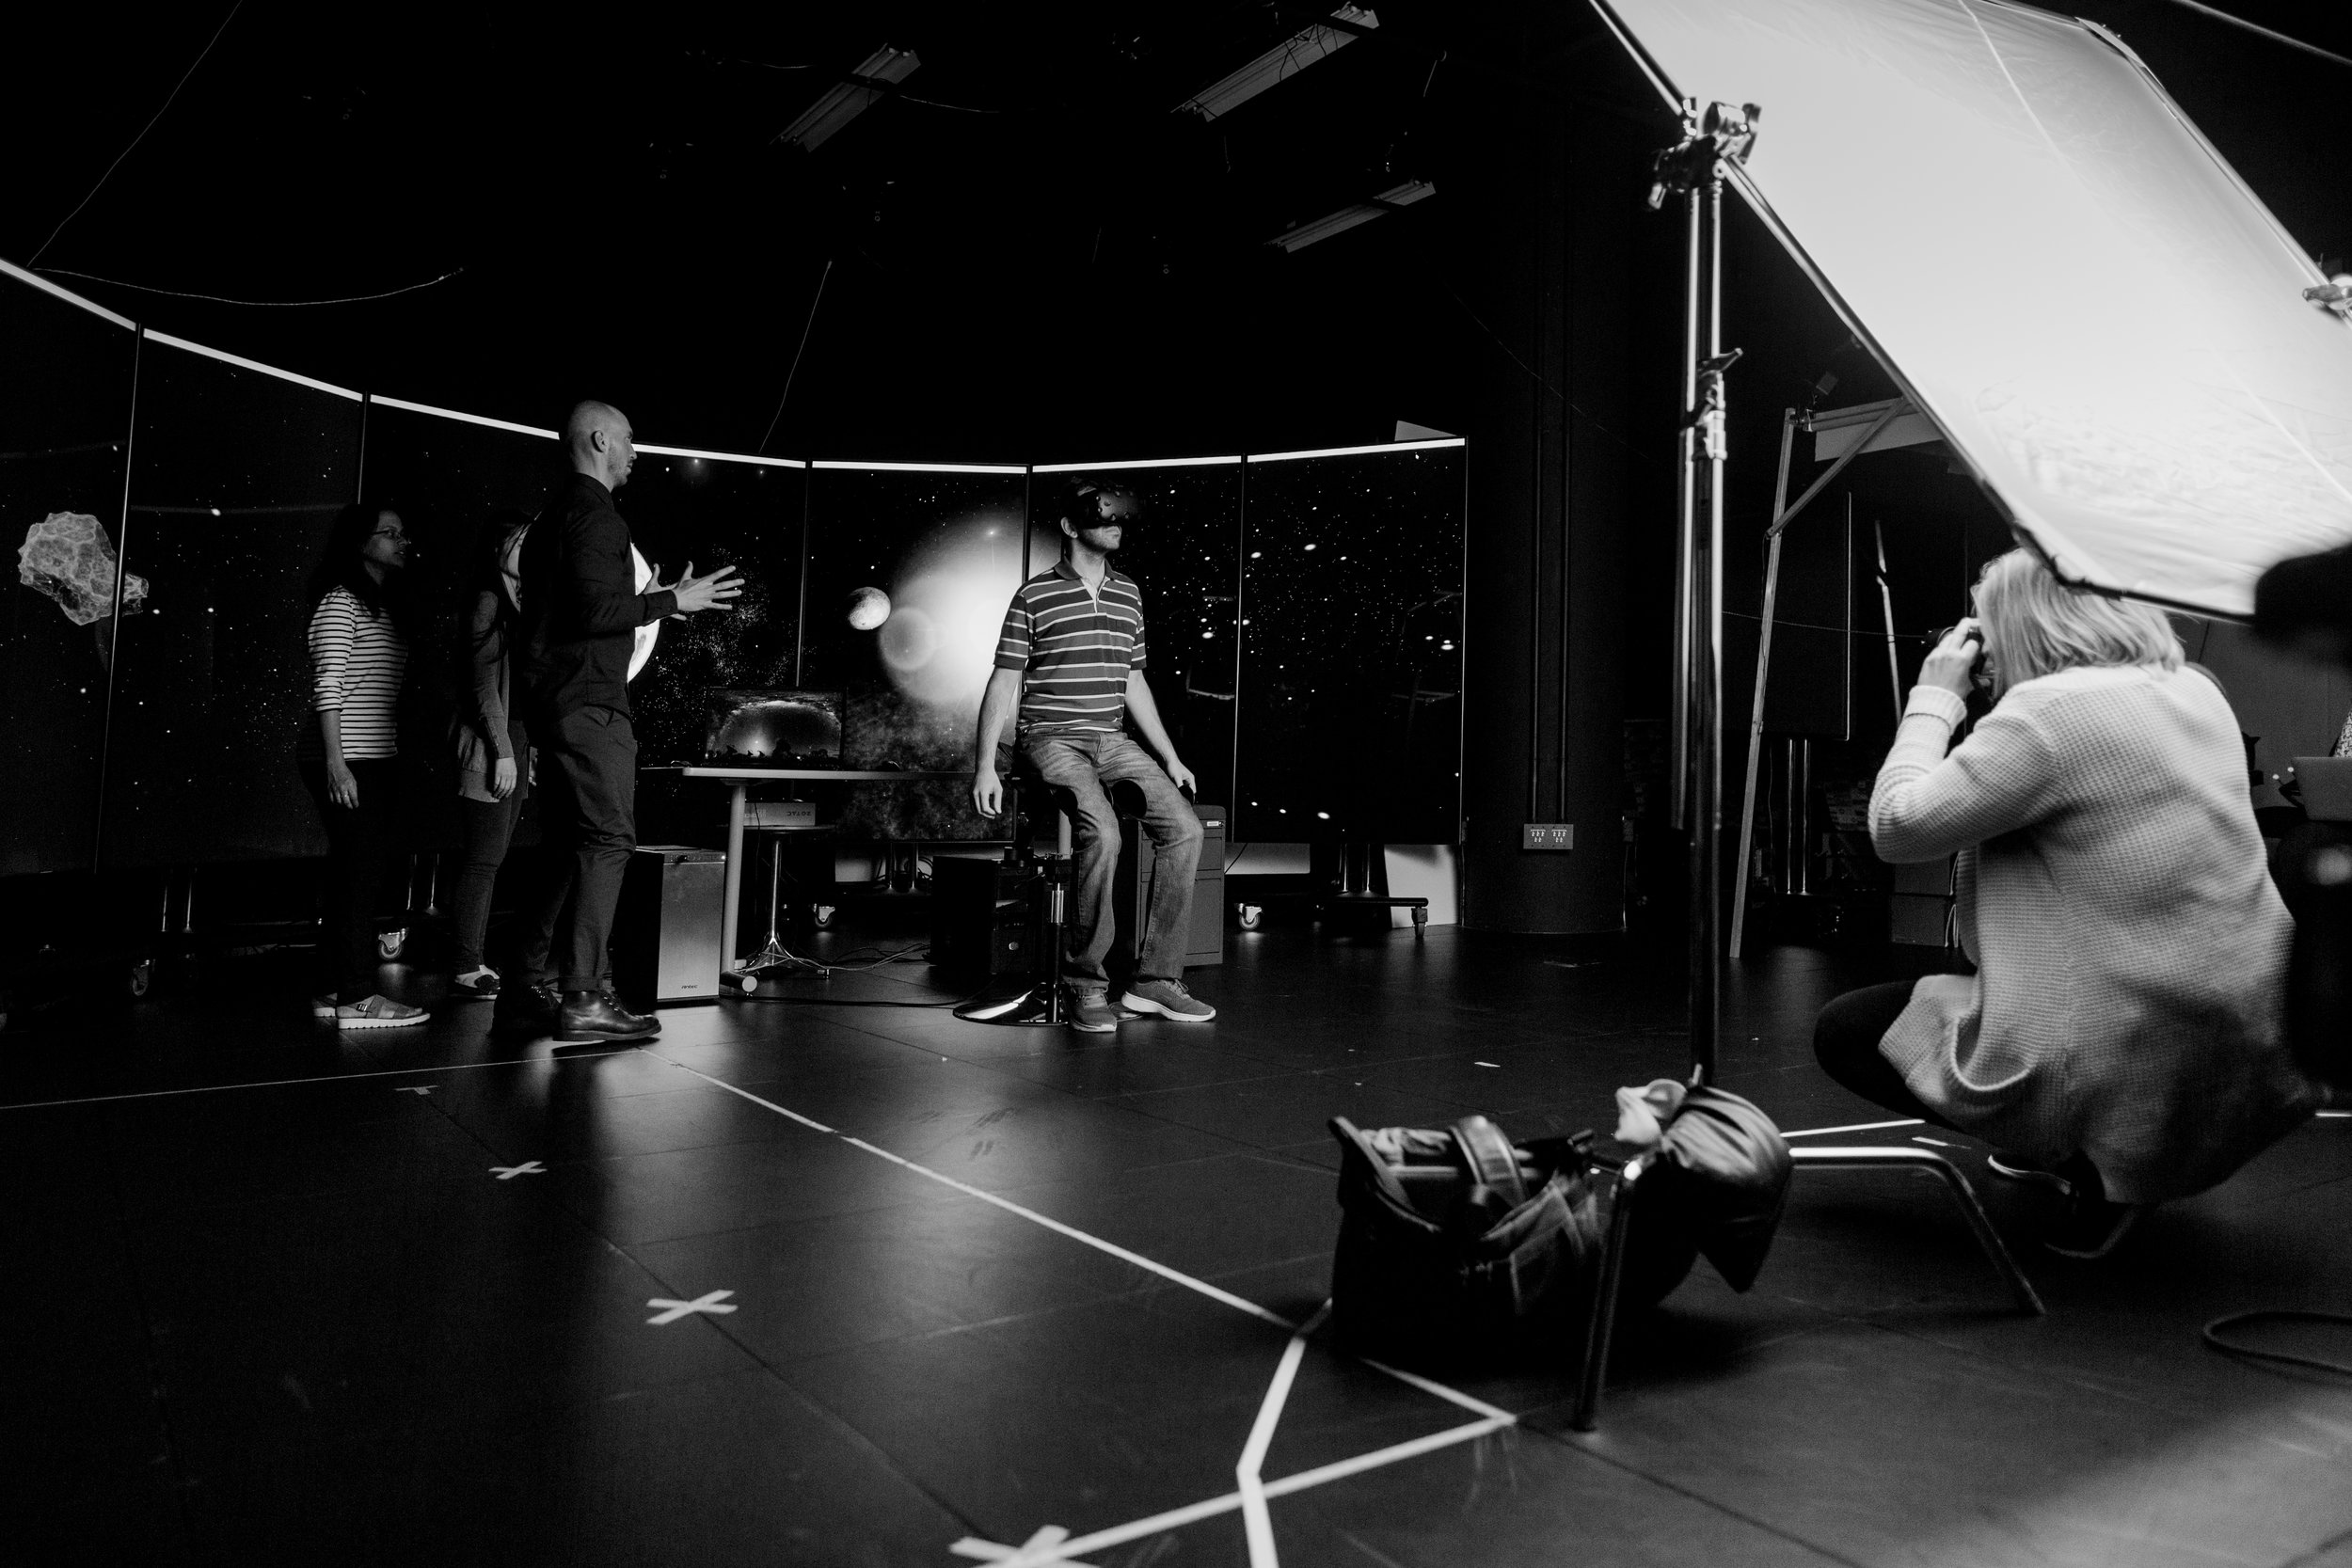 Tim directing and me shooting. Photo: Alexa Mazzarello